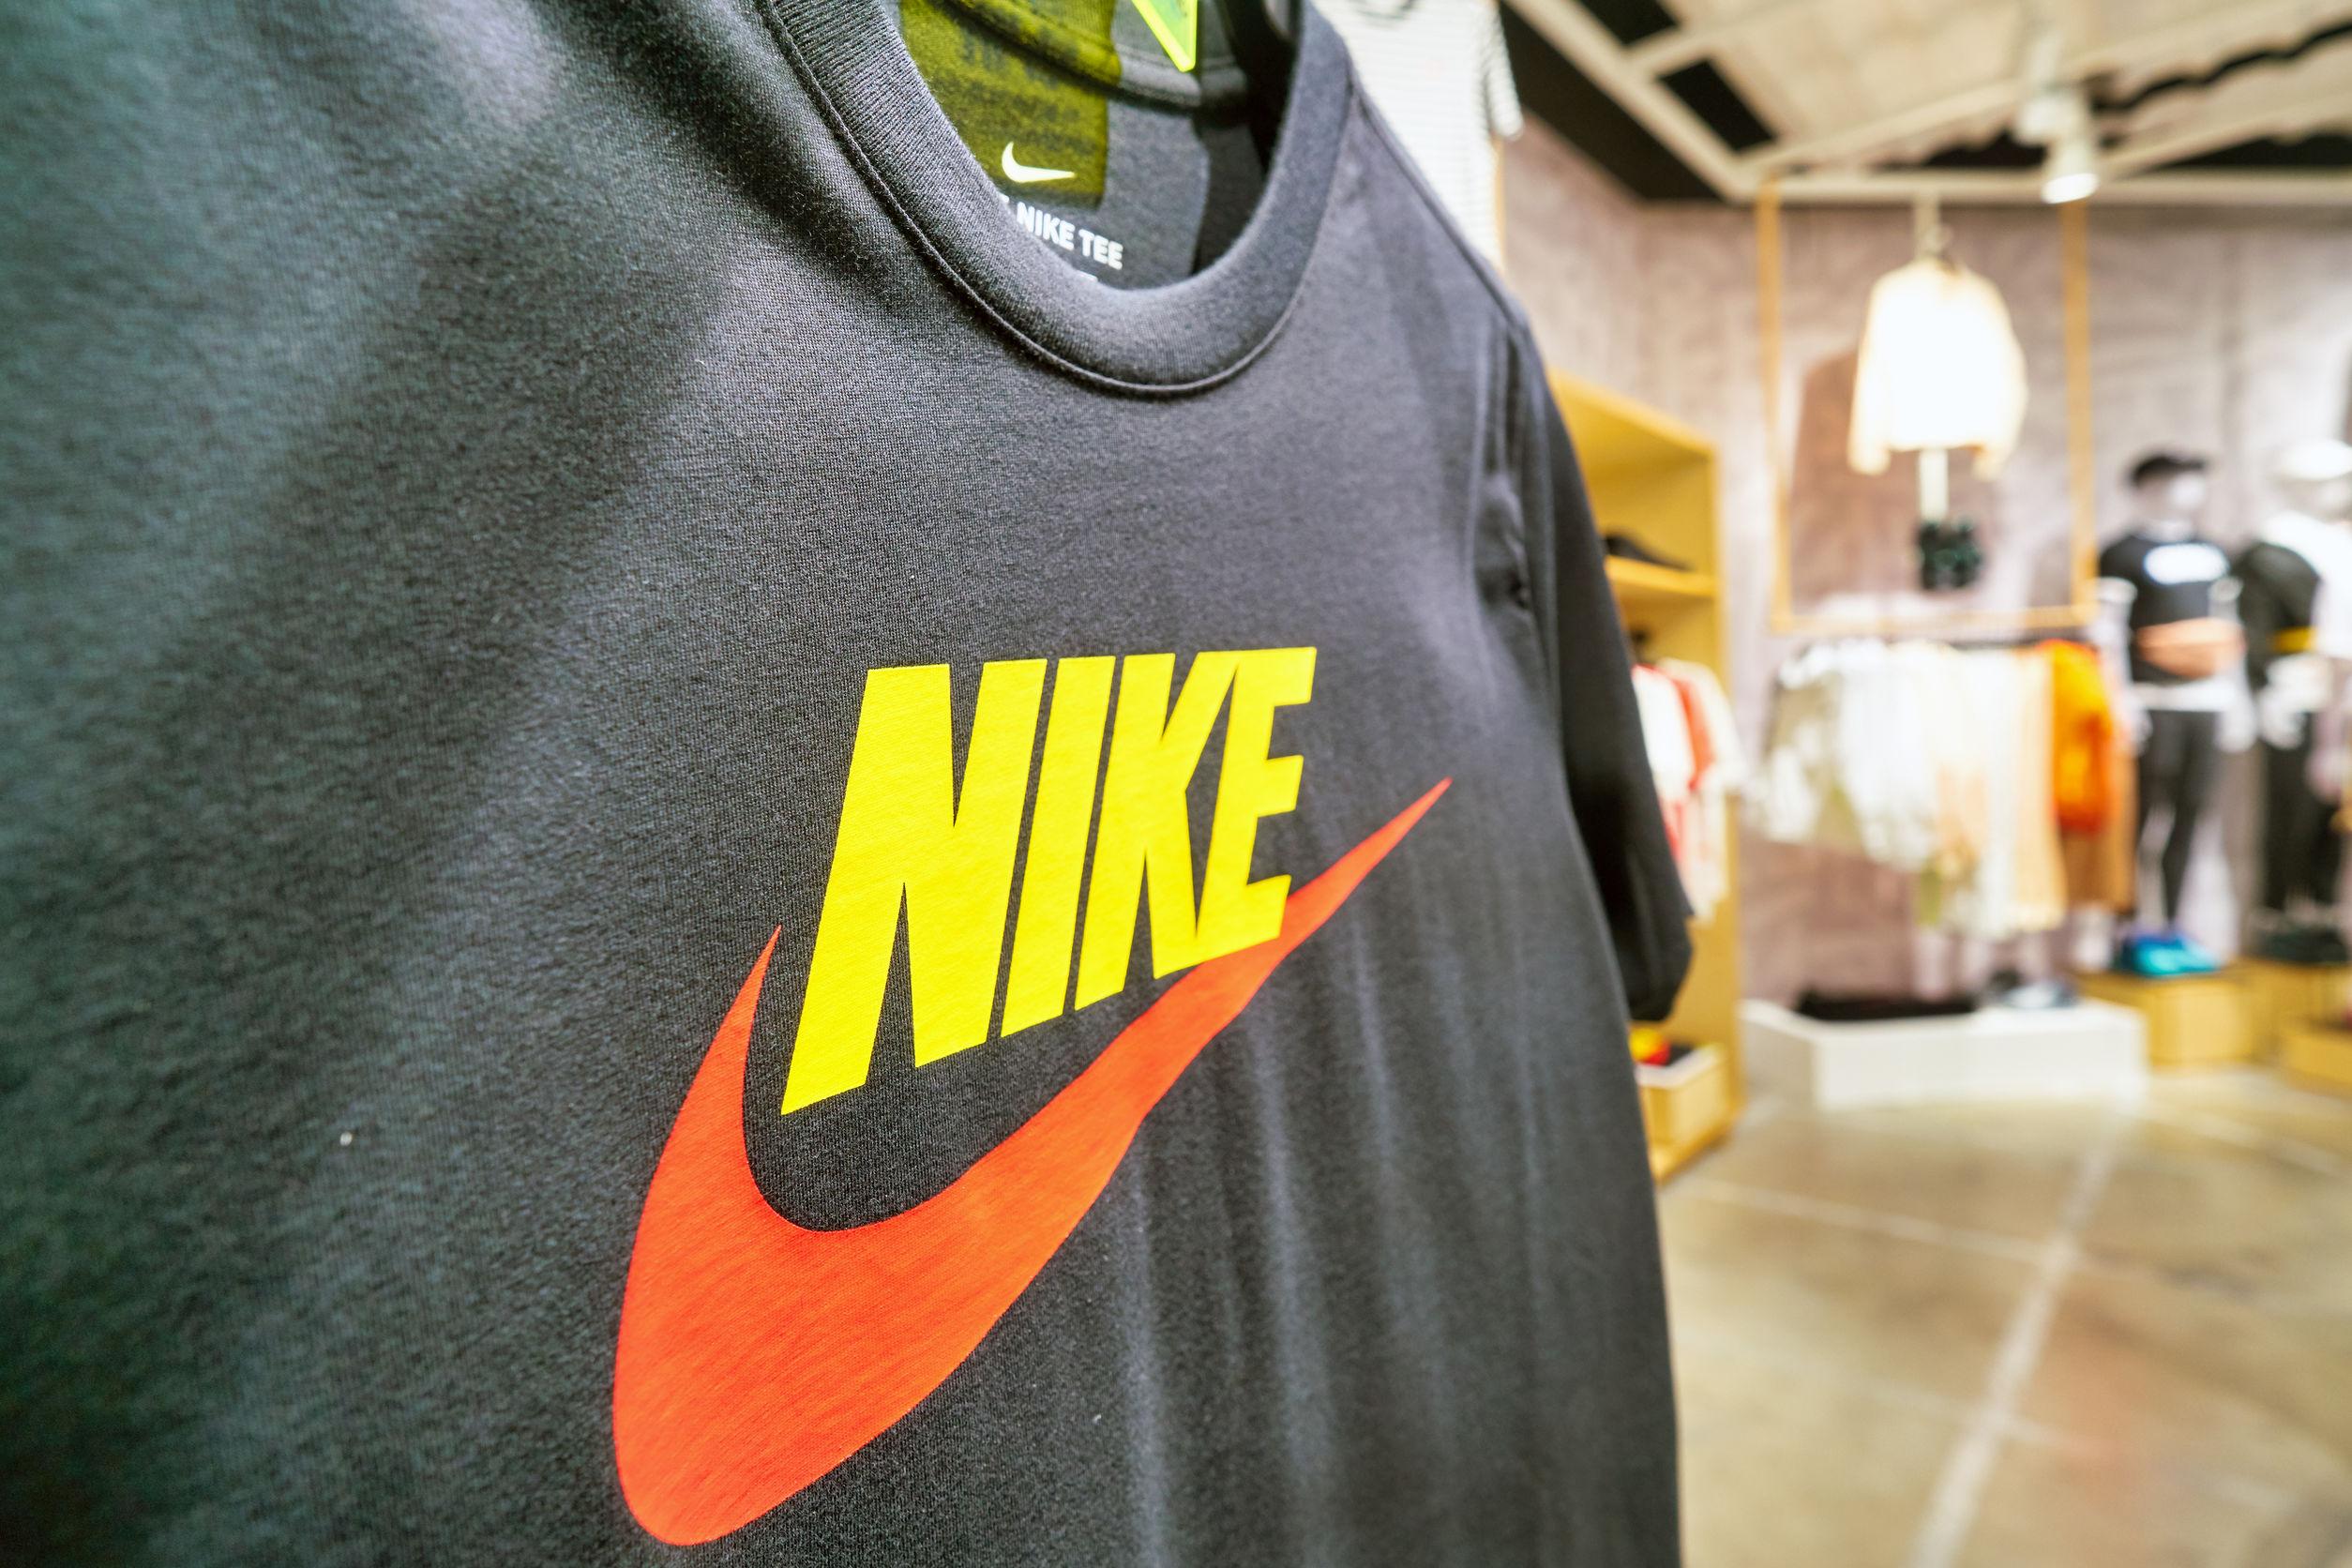 Símbolo de camiseta Nike.